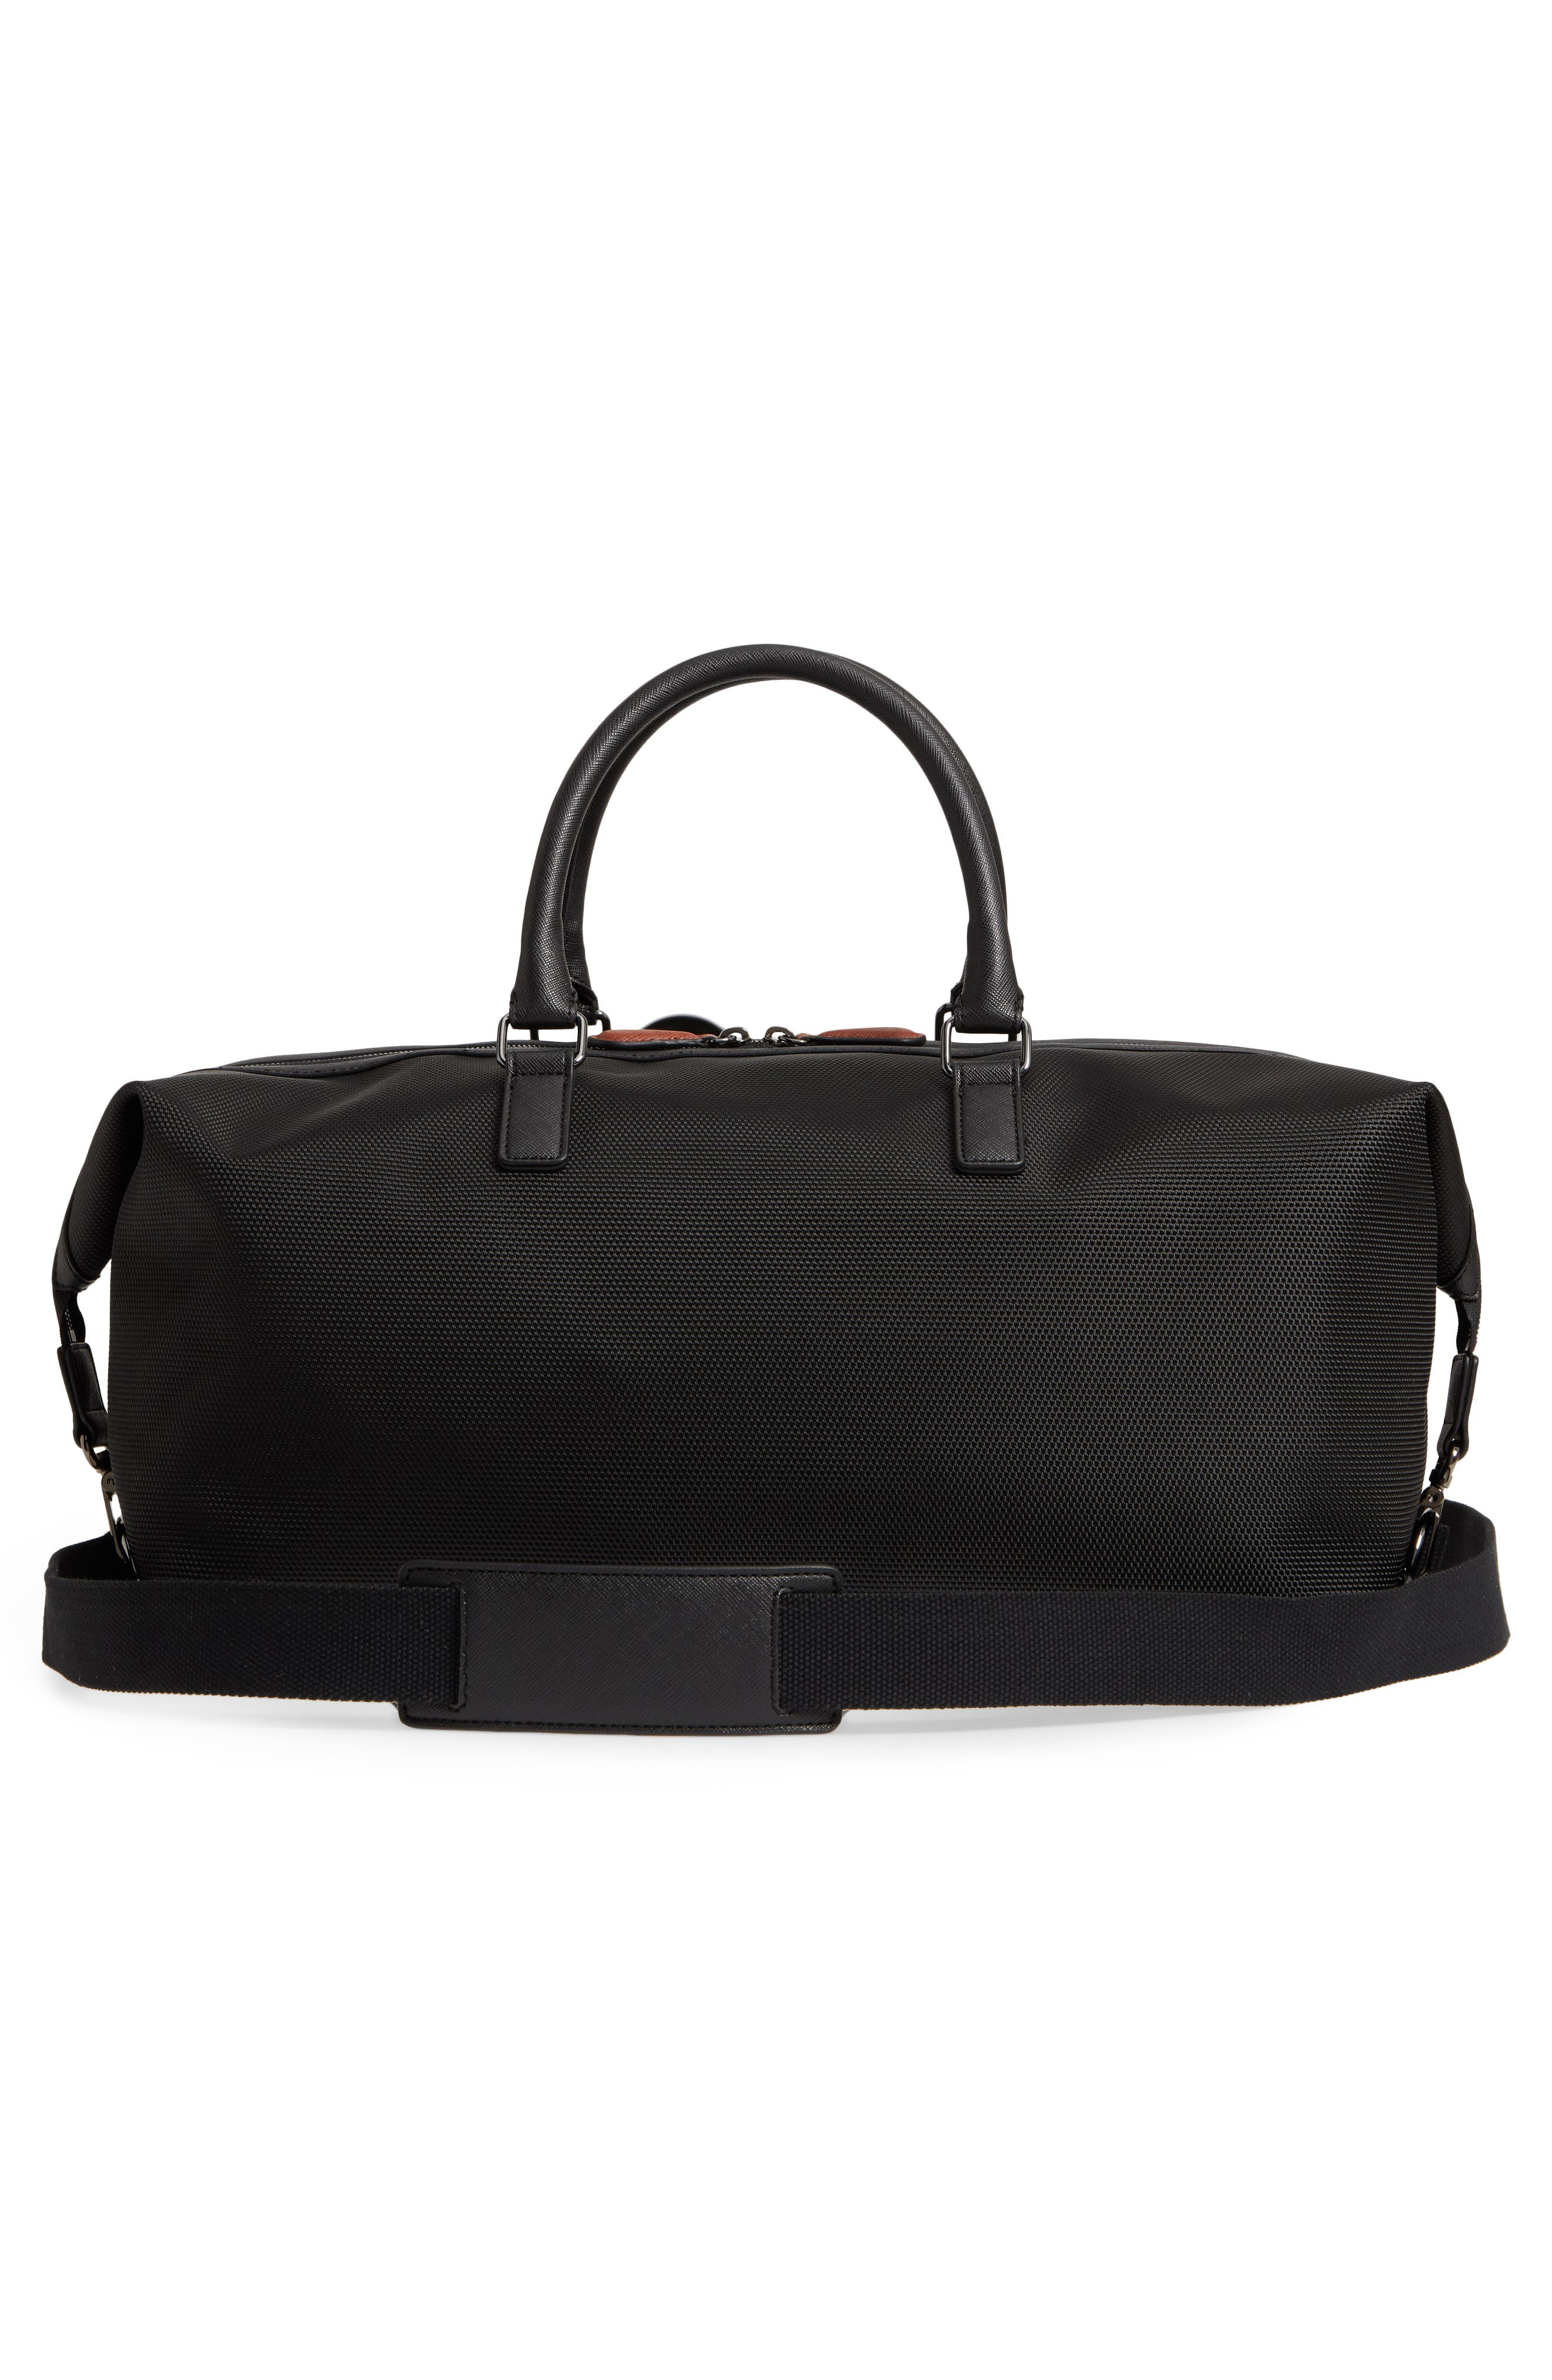 Smart Duffel Bag,                             Alternate thumbnail 3, color,                             Black